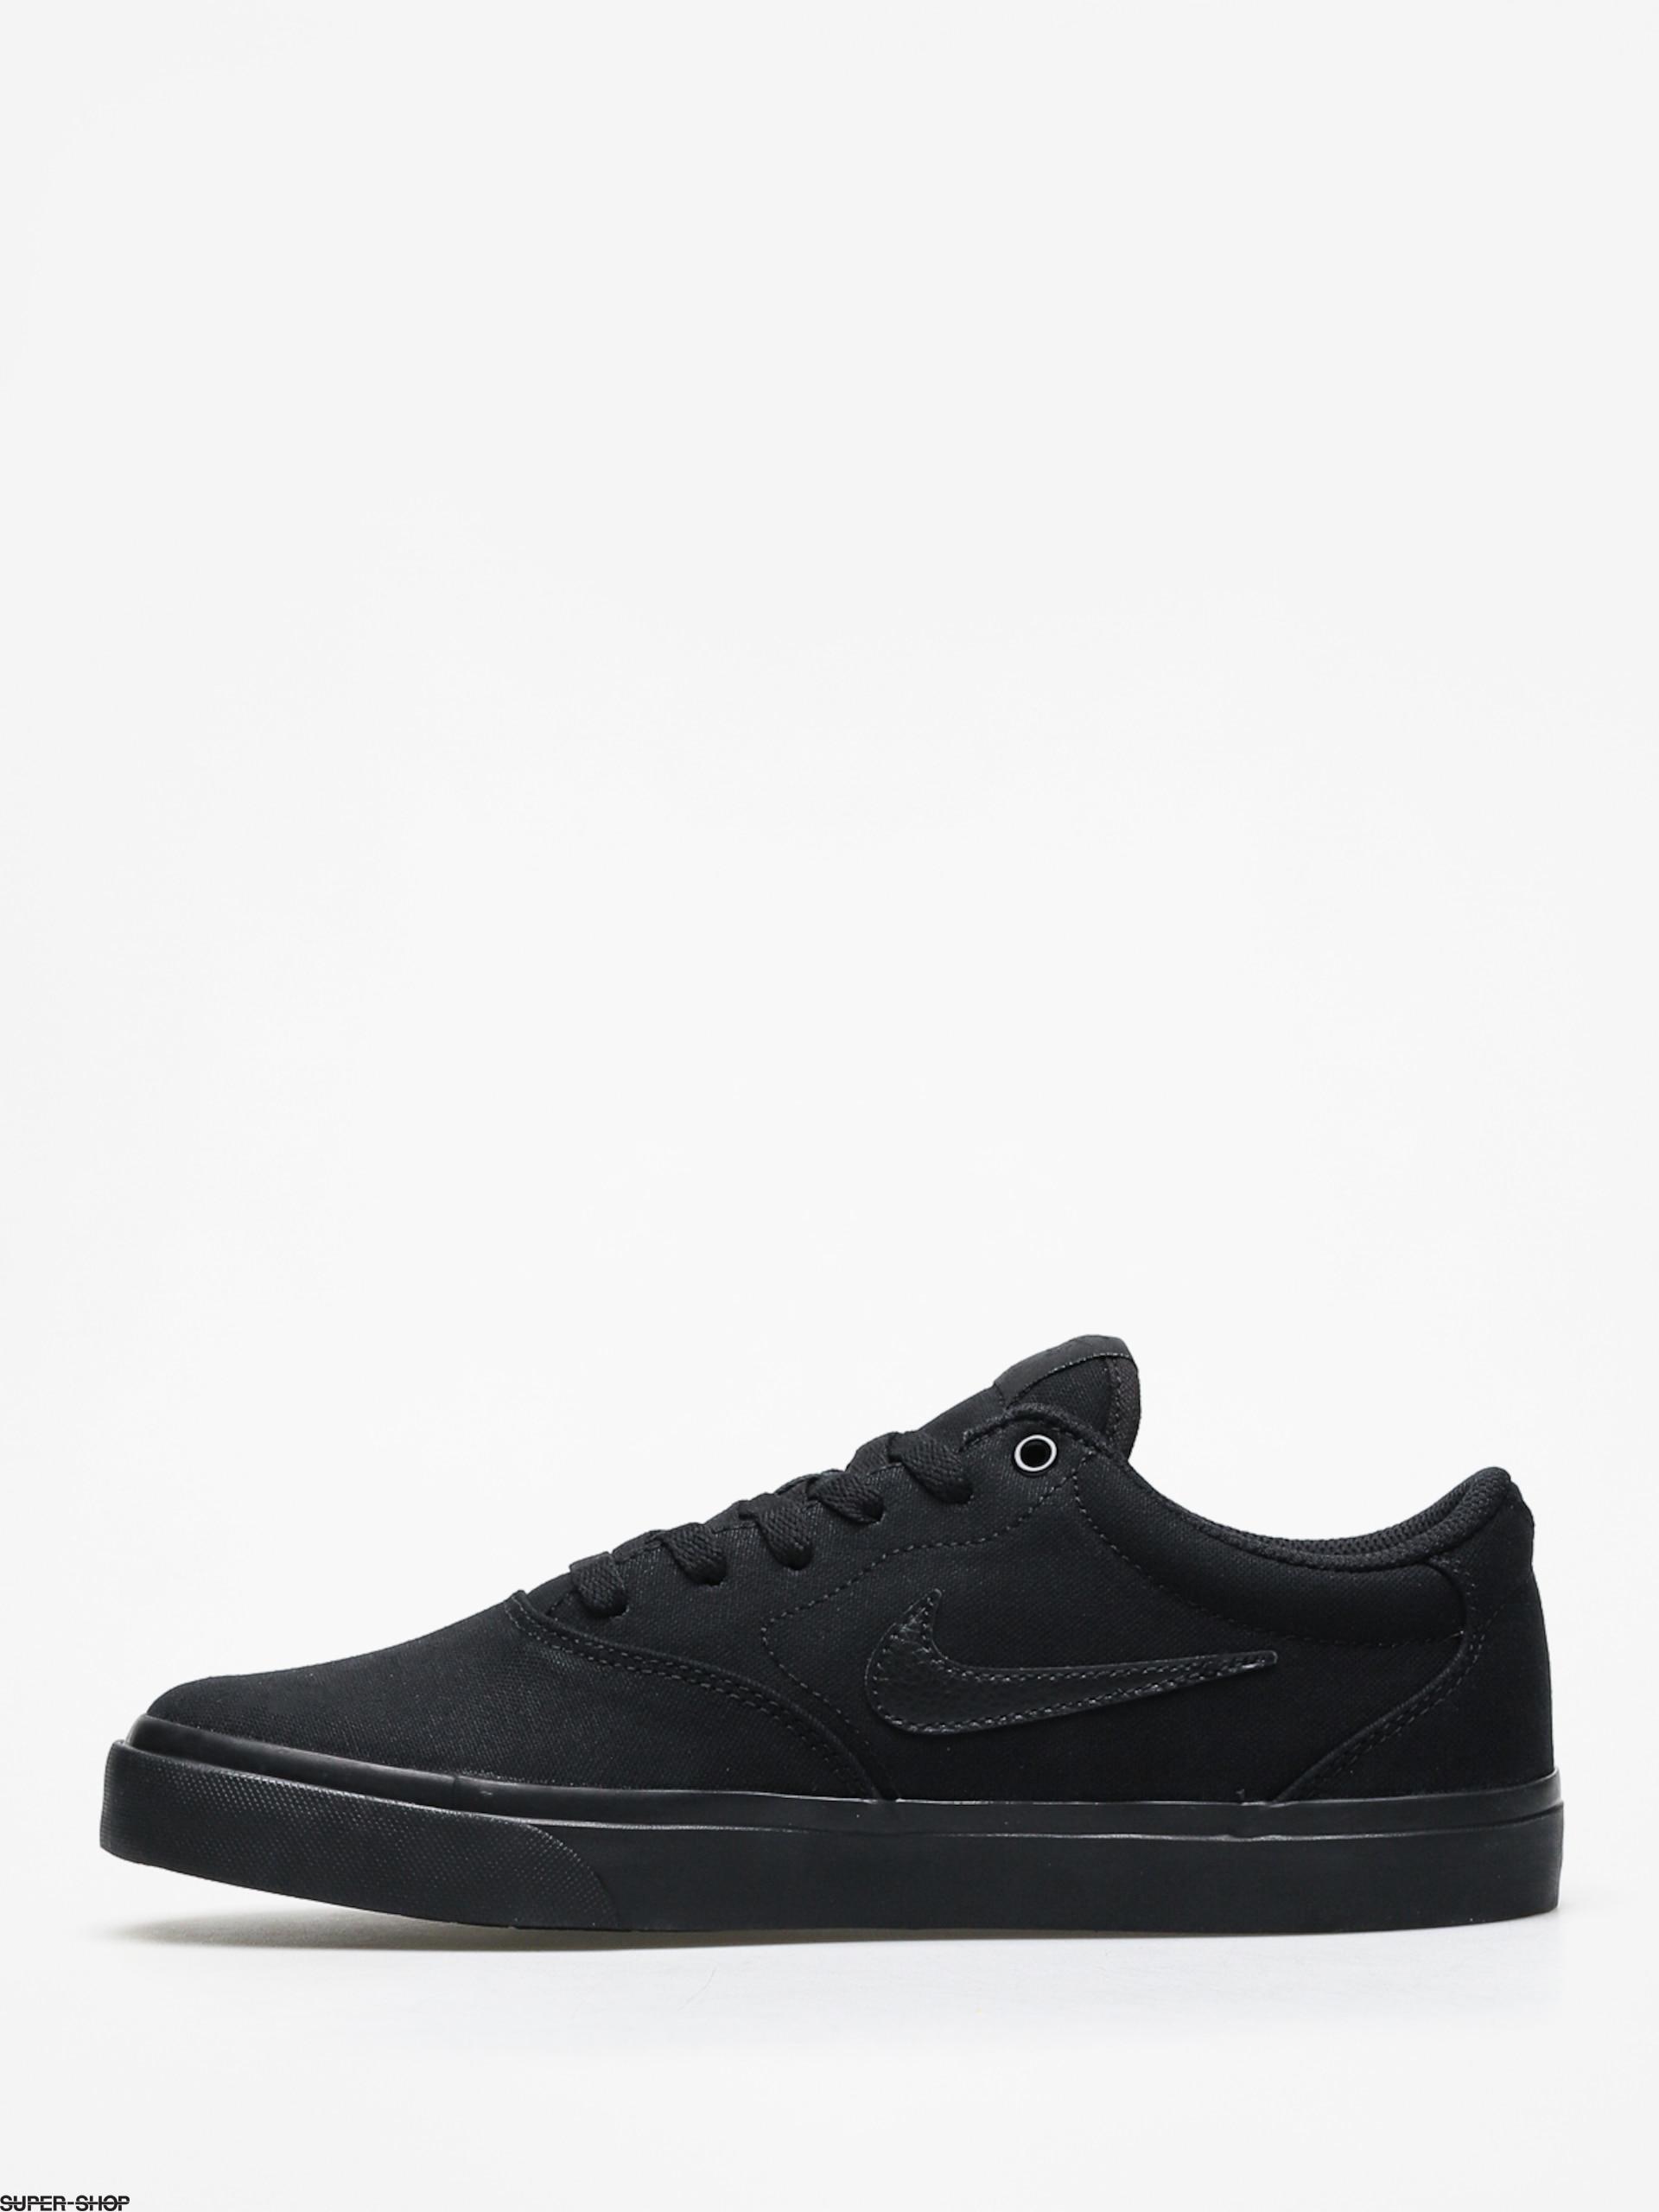 a693576eb1ac 1043819-w1920-nike-sb-sb-charge-slr-shoes-black-black-black.jpg